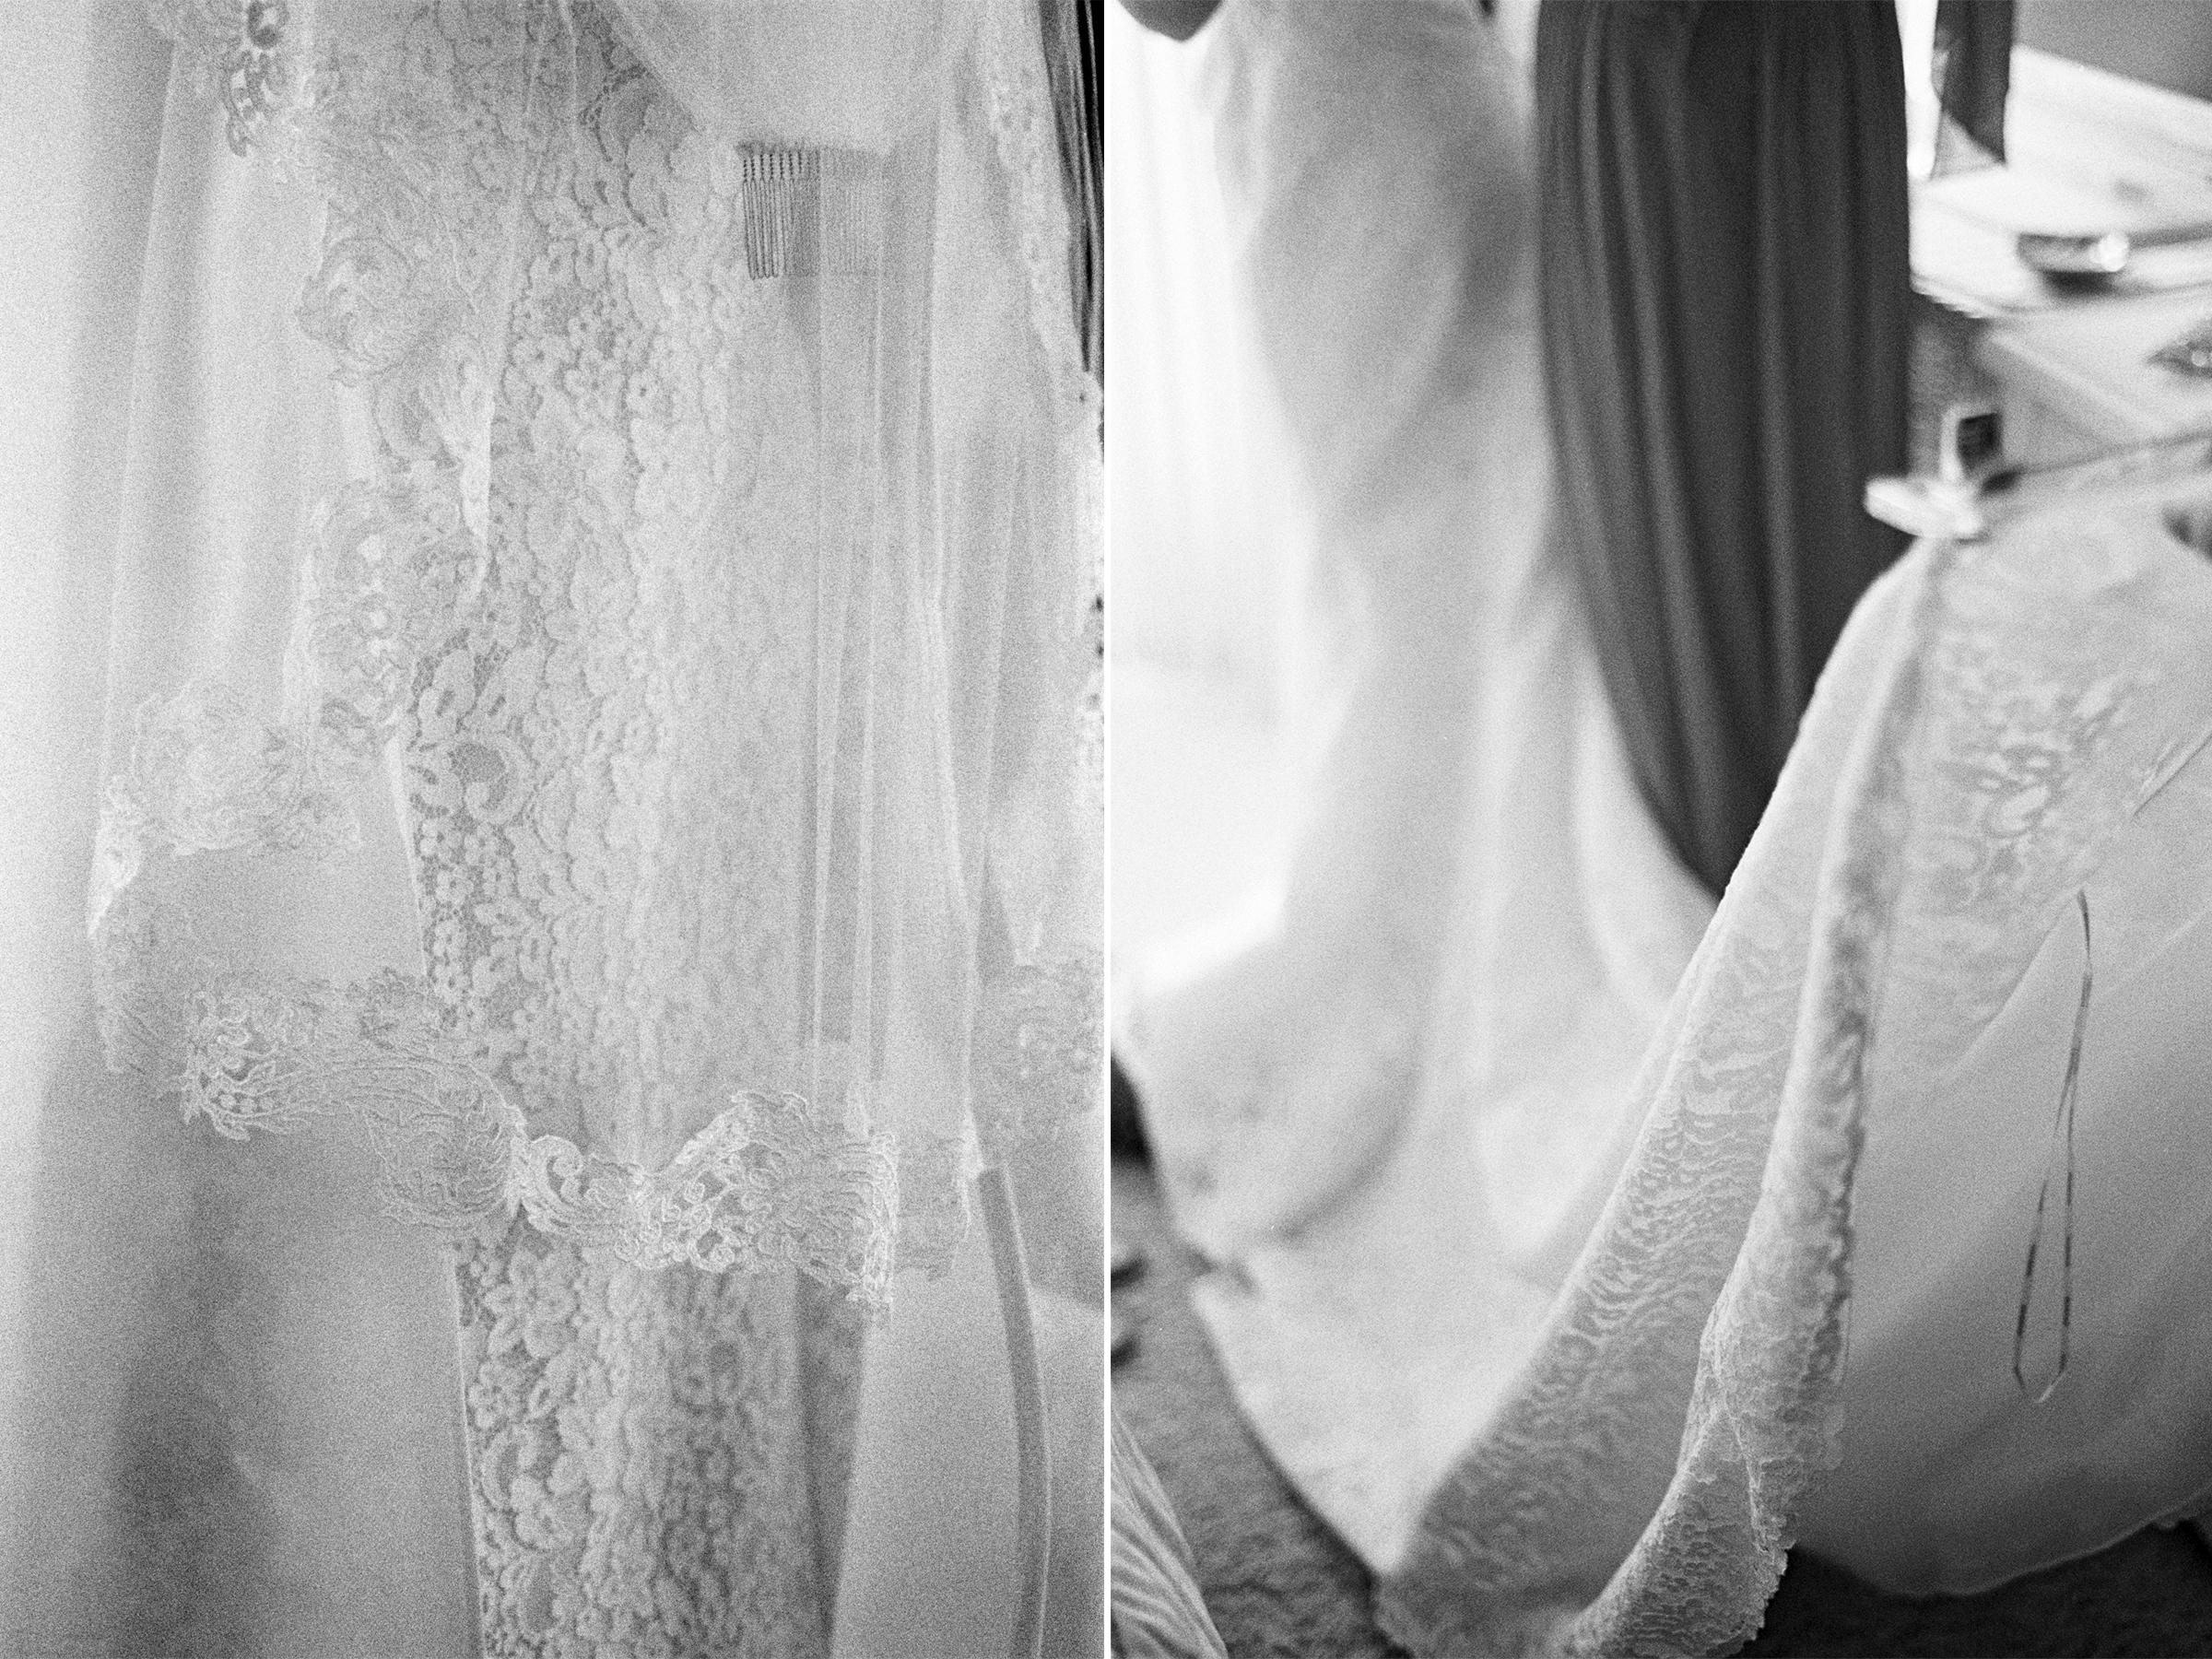 Carolyn+Dominic-Black and White FILM- Lace Wedding Dress VESA- Congress Hall Wedding- Cape May New Jersey- Olivia Christina Photo-1-2.JPG